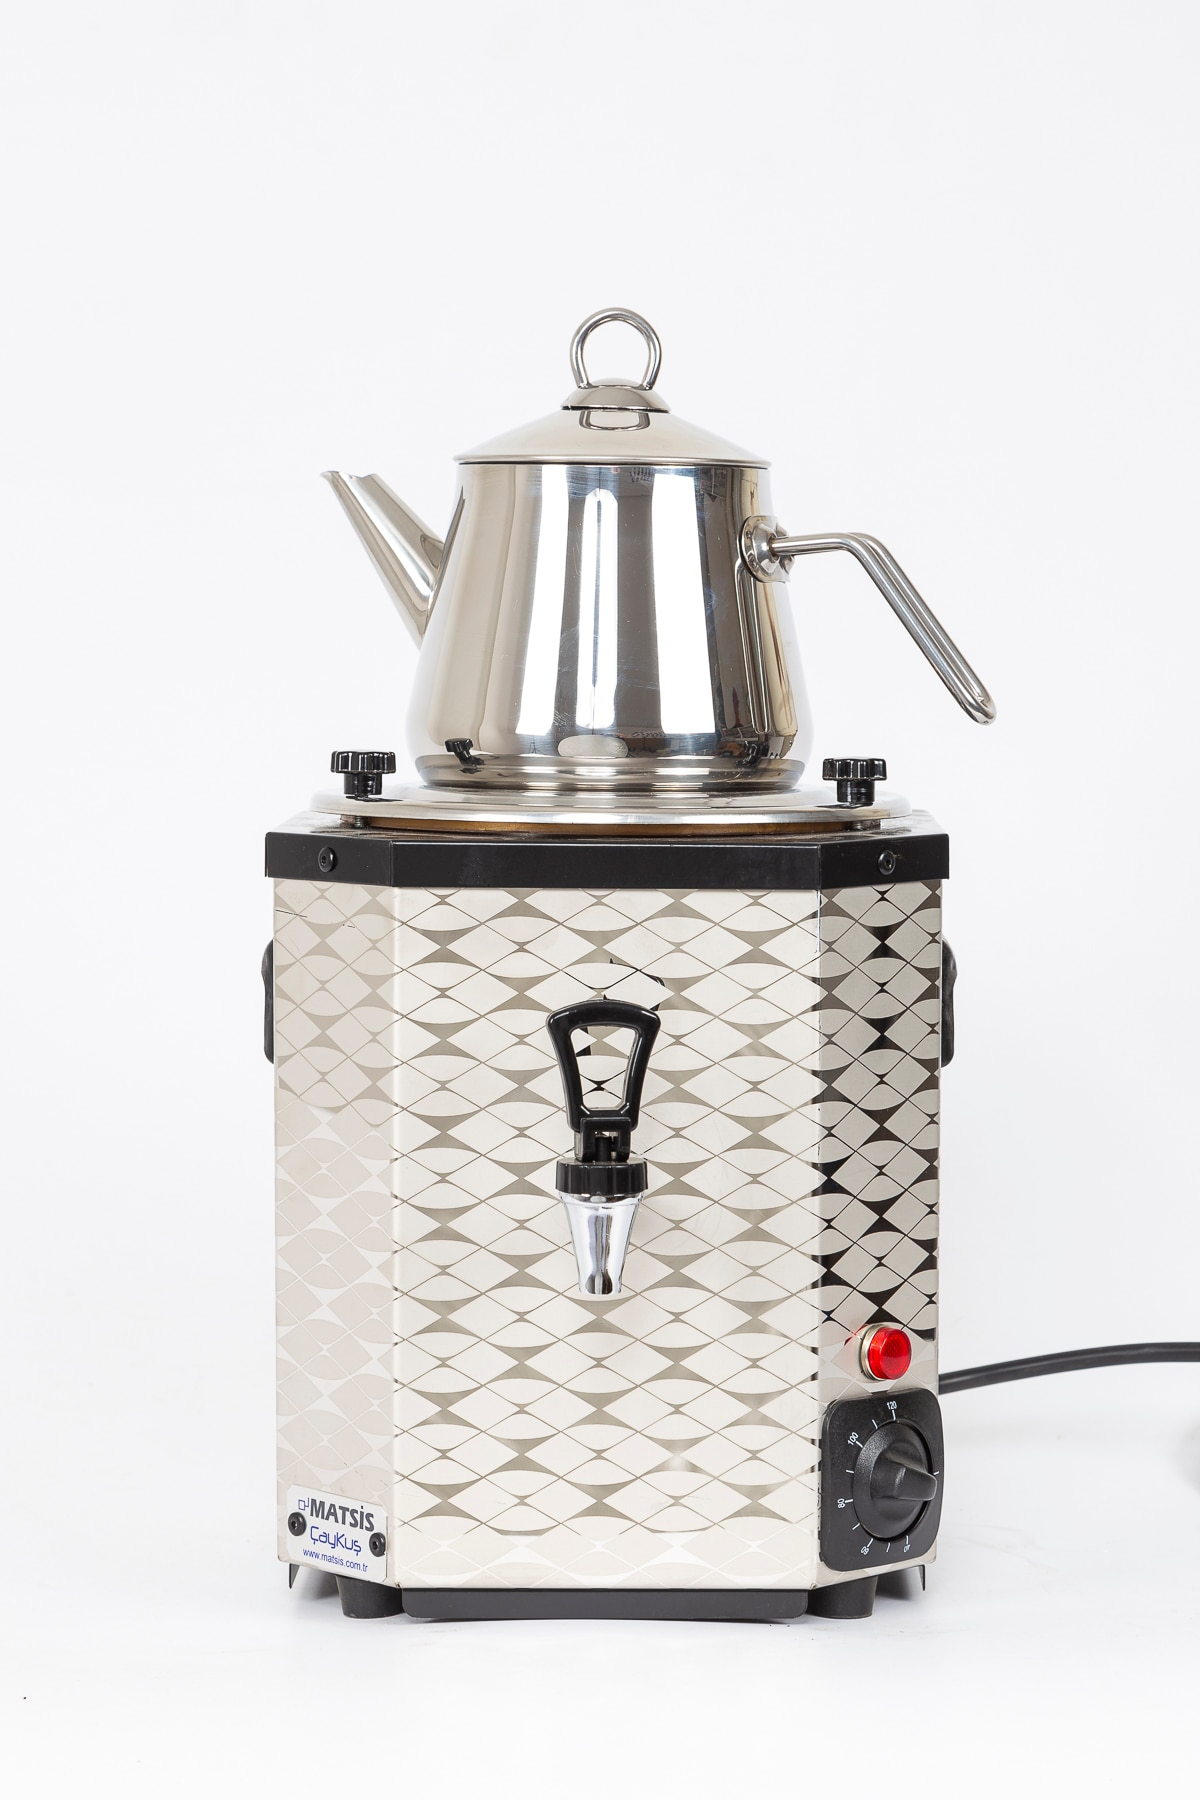 TeaBird أصيلة التركية اليدوية قلادة فضية من الفولاذ المقاوم للصدأ الشاي المرجل الساخن ماكينة إعداد الشاي غلاية موقد إبريق الشاي